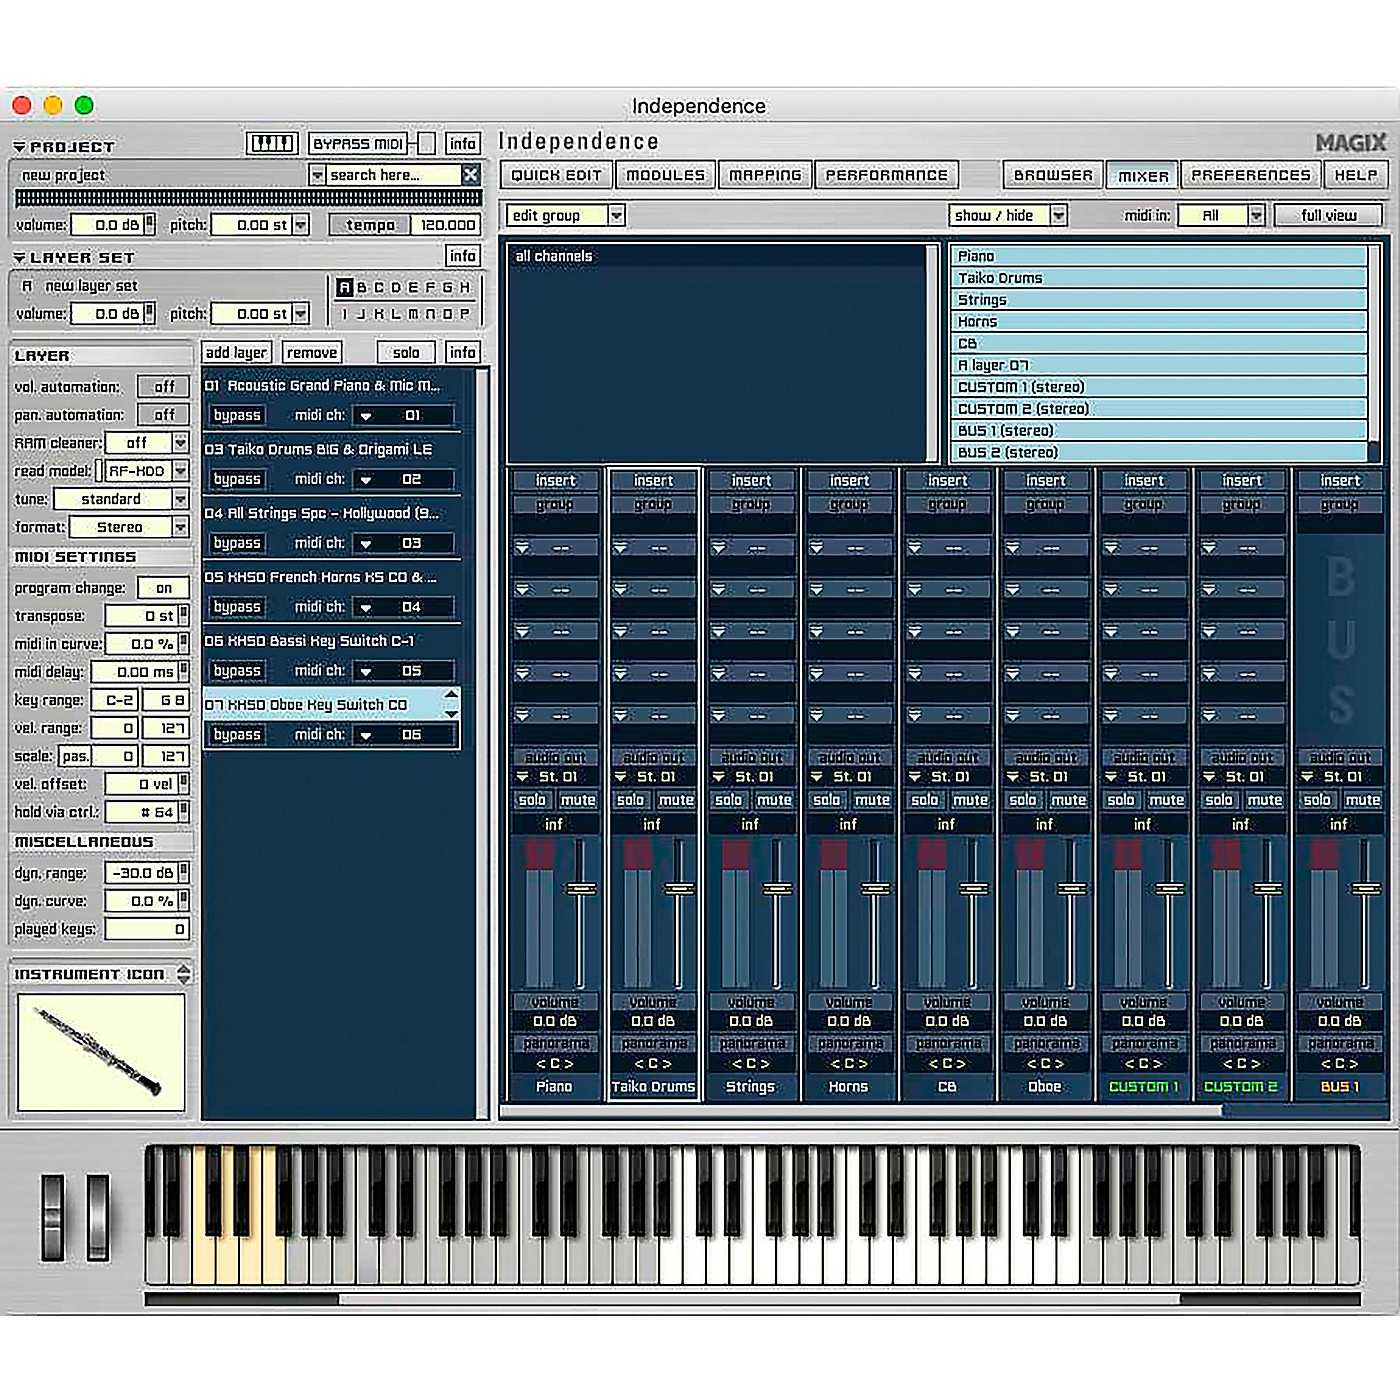 Magix Independence Pro Standard PC/MAC thumbnail